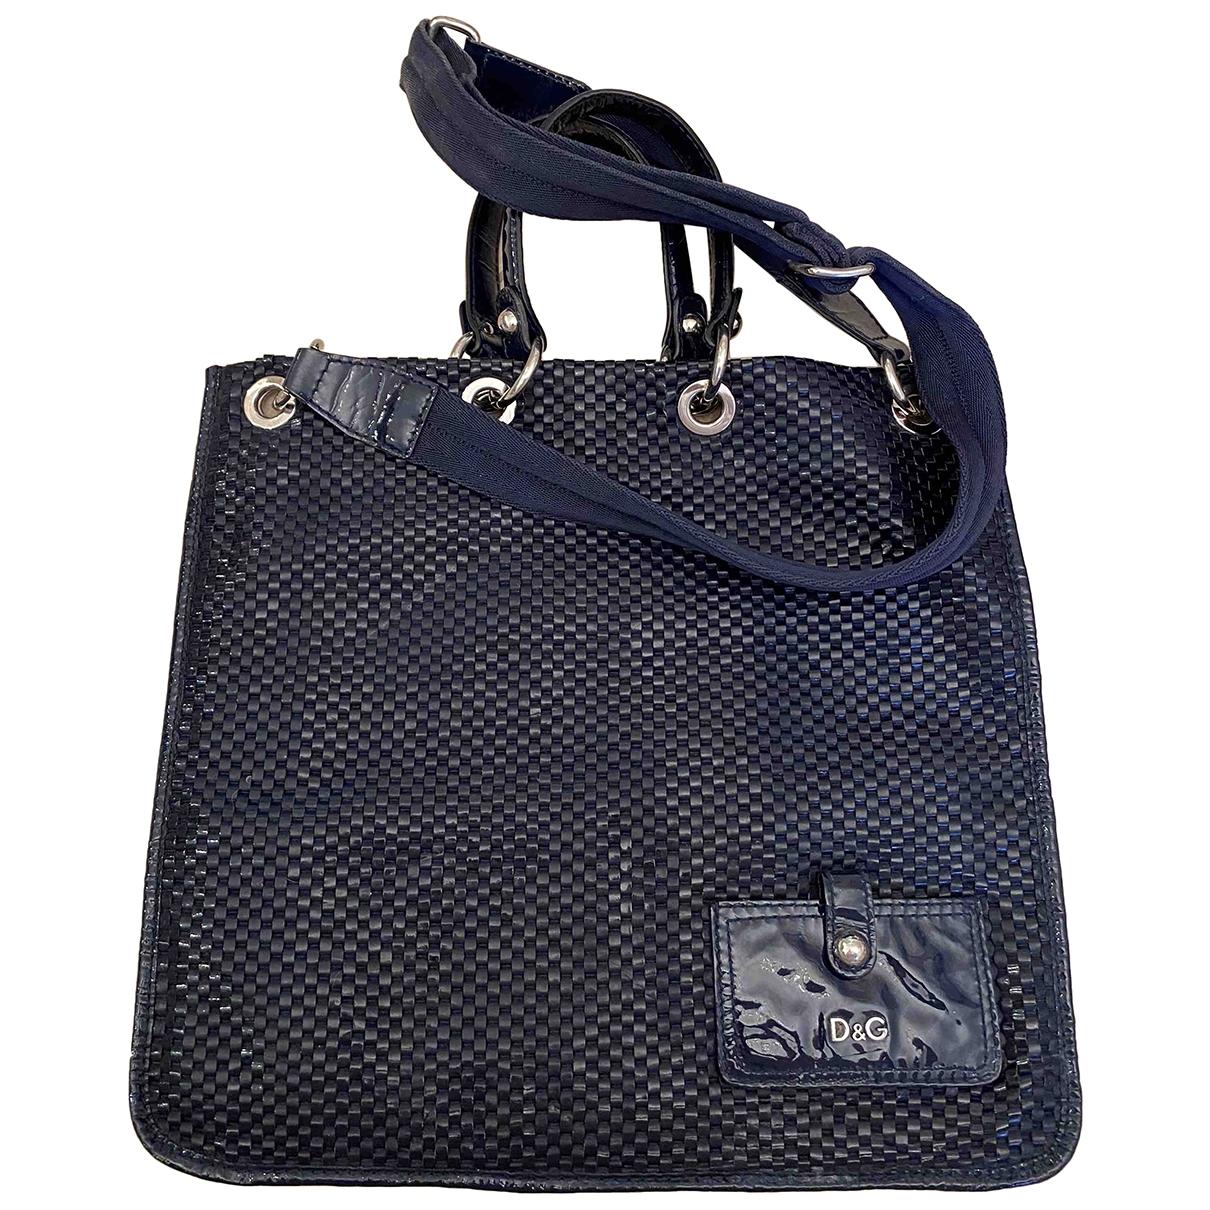 D&g \N Handtasche in  Marine Lackleder